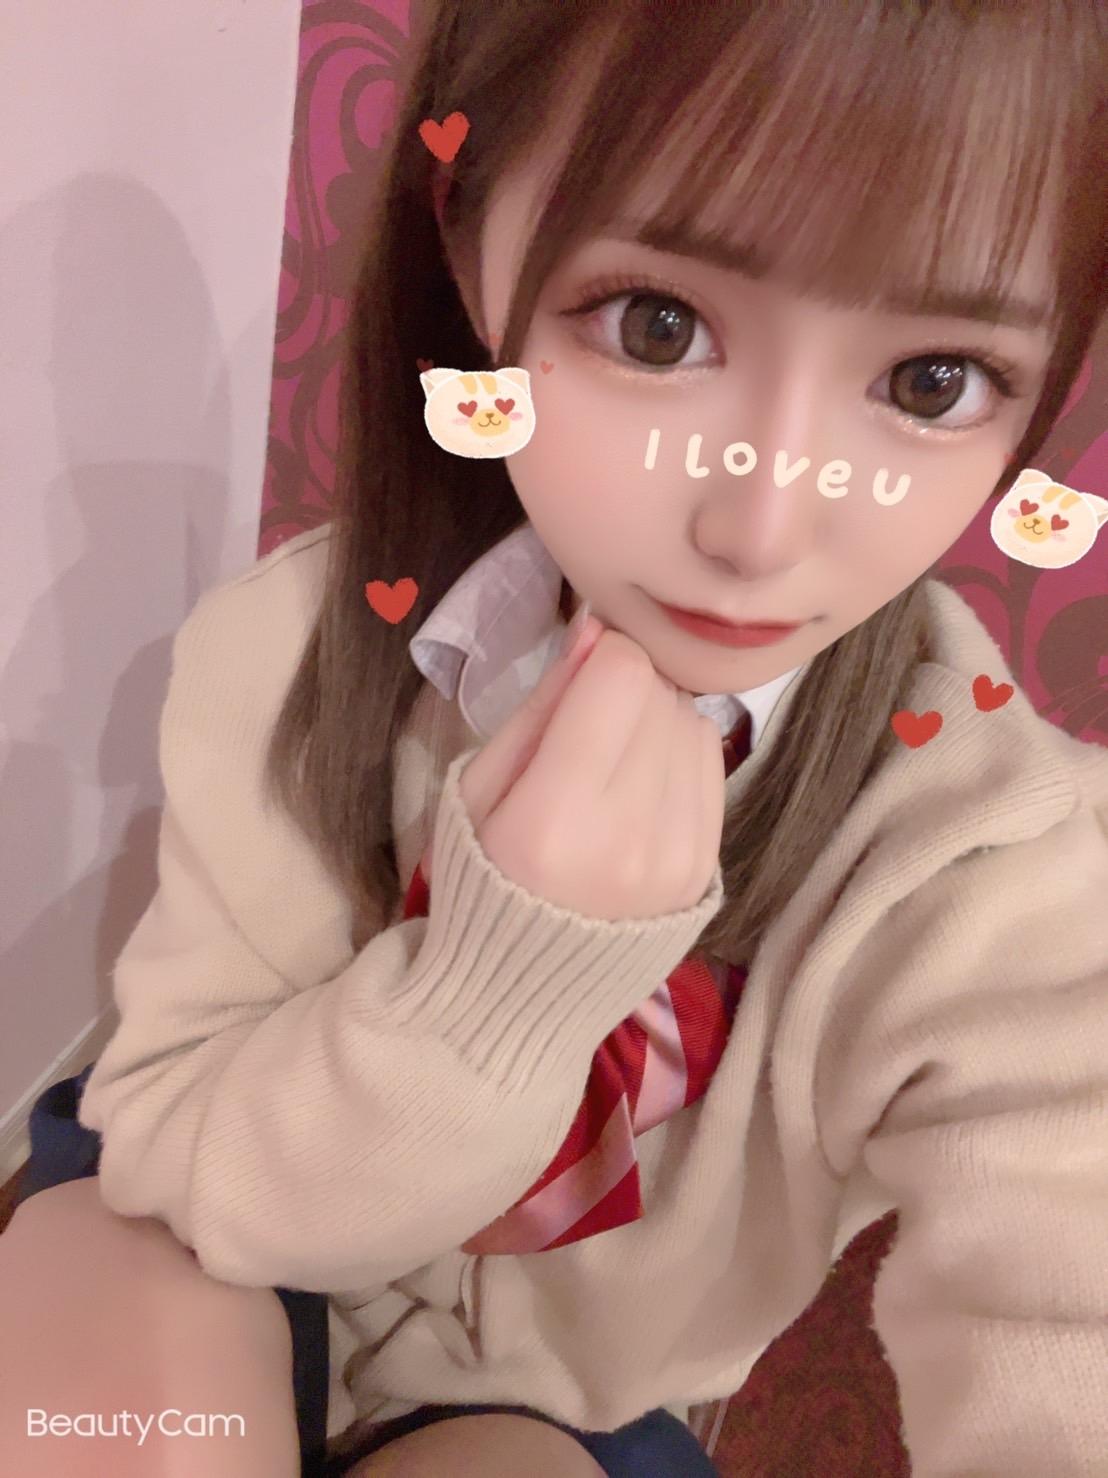 【JKリフレ東京】桜田りぼん9/25体験入店予定!